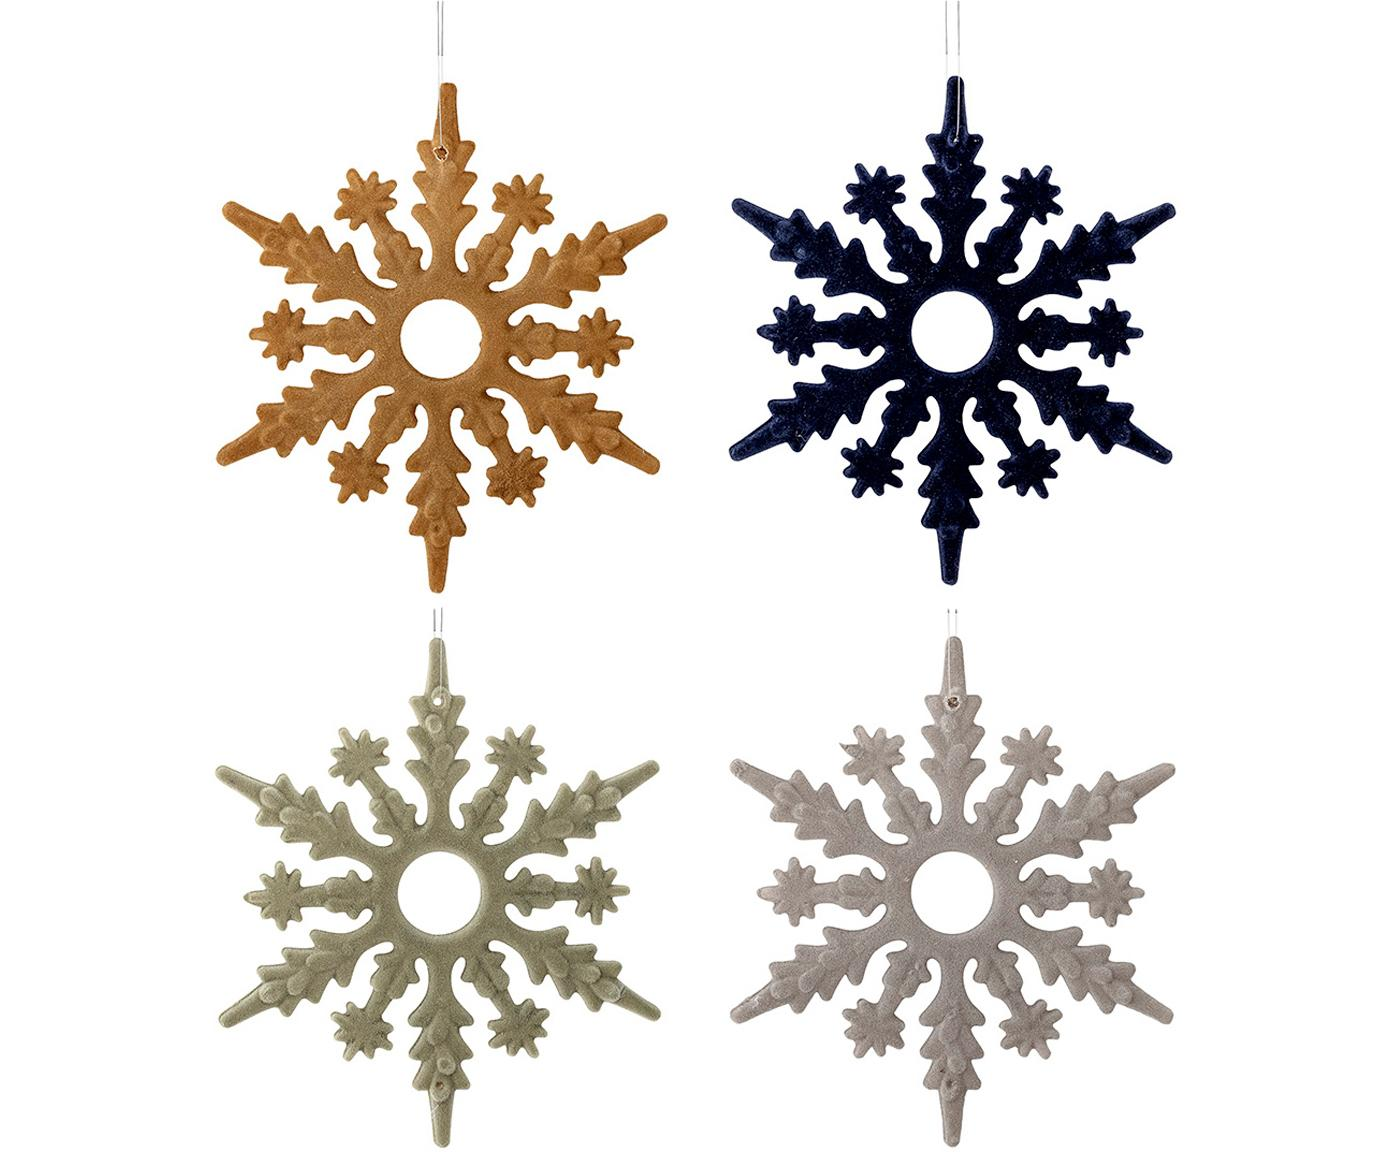 Kerstboomhangersset Snowflakes, 4-delig, Polypropyleen, polyester, Mosterdgeel, donkerblauw, mintgroen, grijs, Ø 15 cm